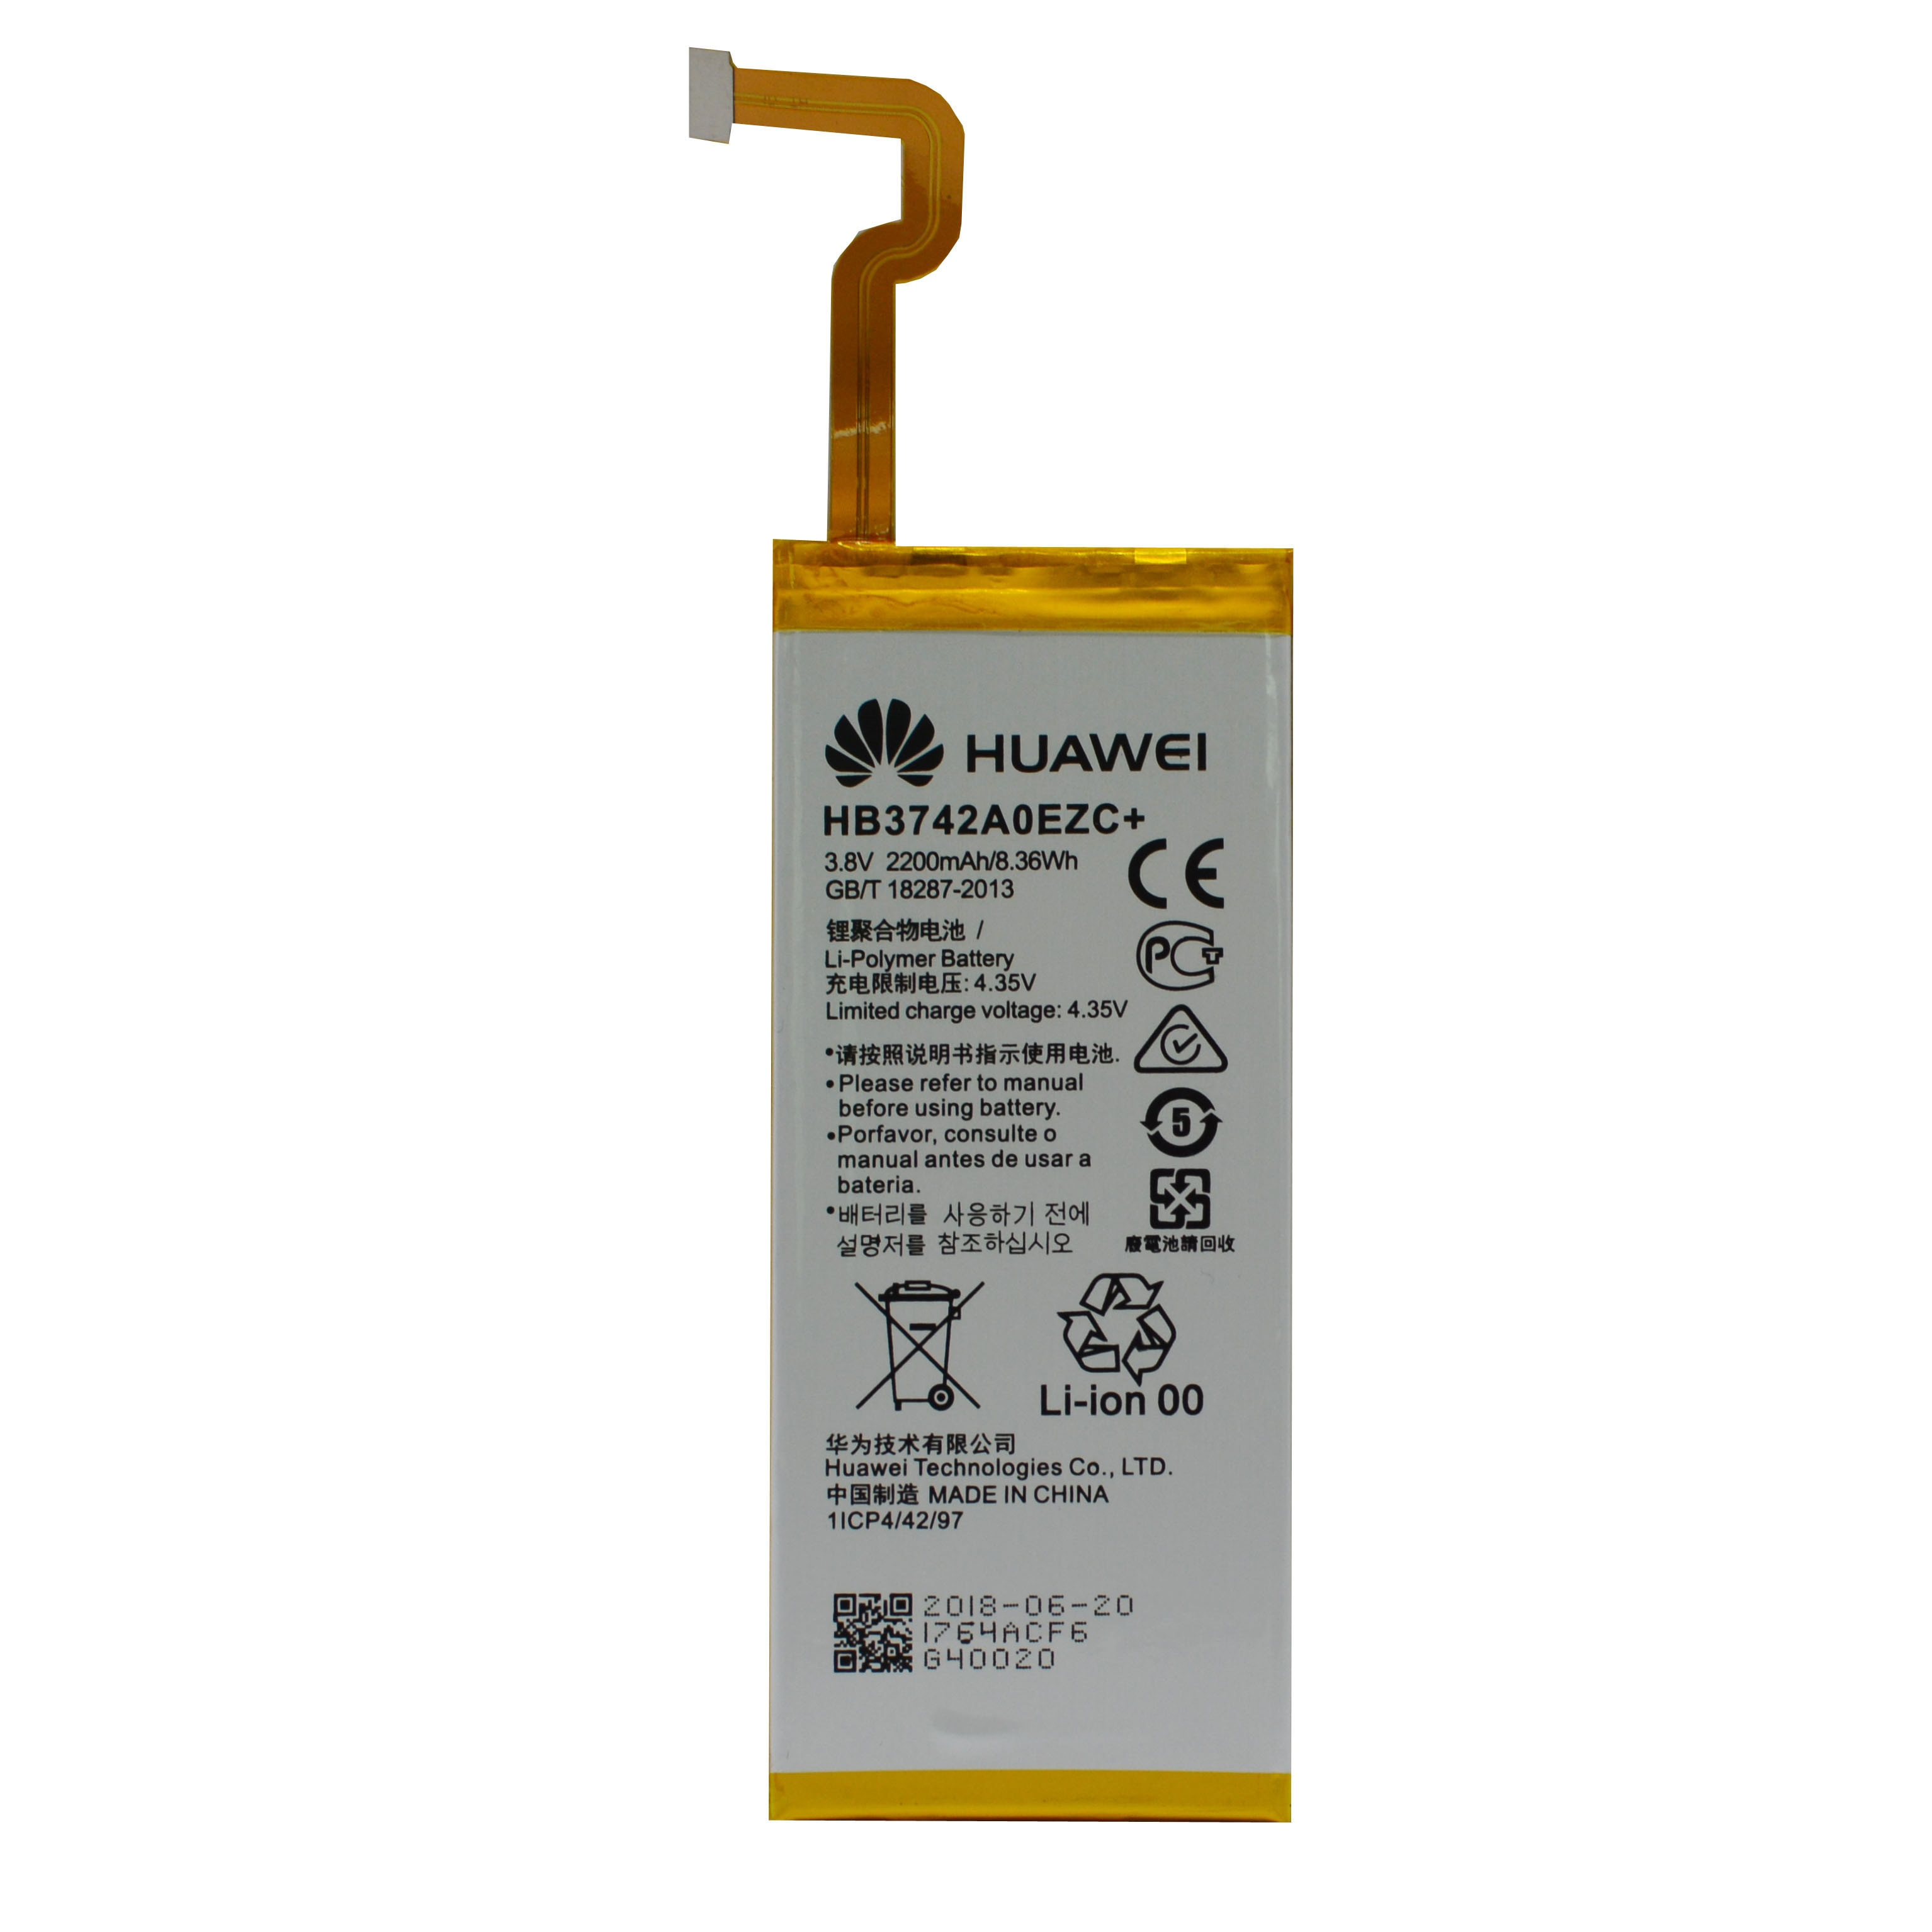 20pcs/lot Battery HB3742A0EZC+ For Huawei P8 Lite Ascend P8 Lite Original Replacement Phone Bateria Akku 2200mAh enlarge